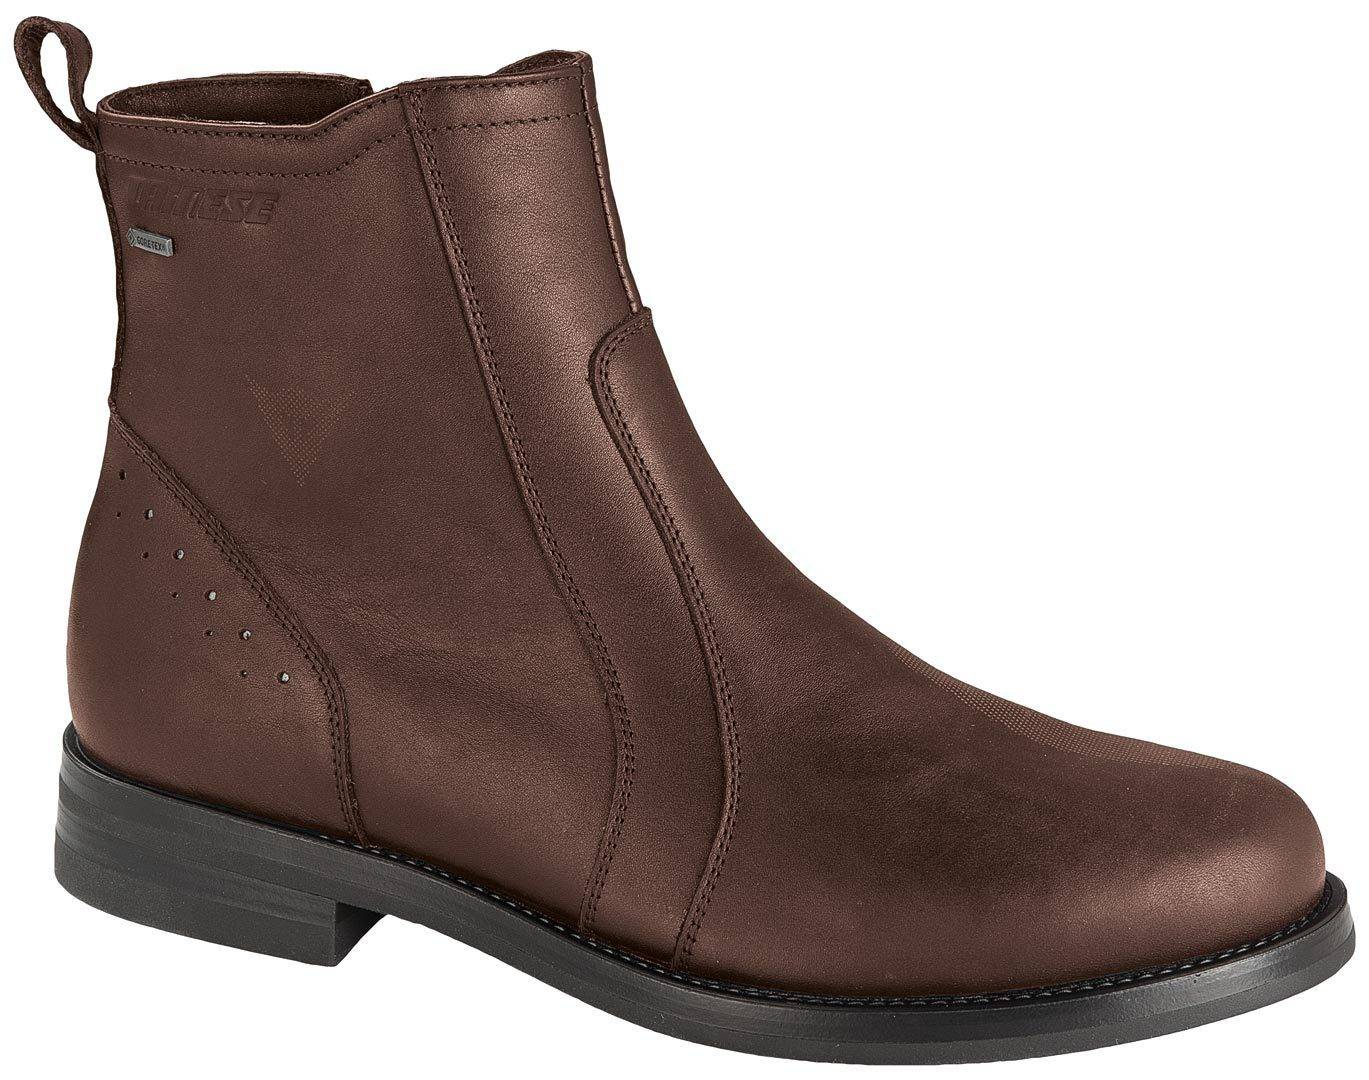 Dainese S. Germain Gore-Tex Zapatos Marrón 40